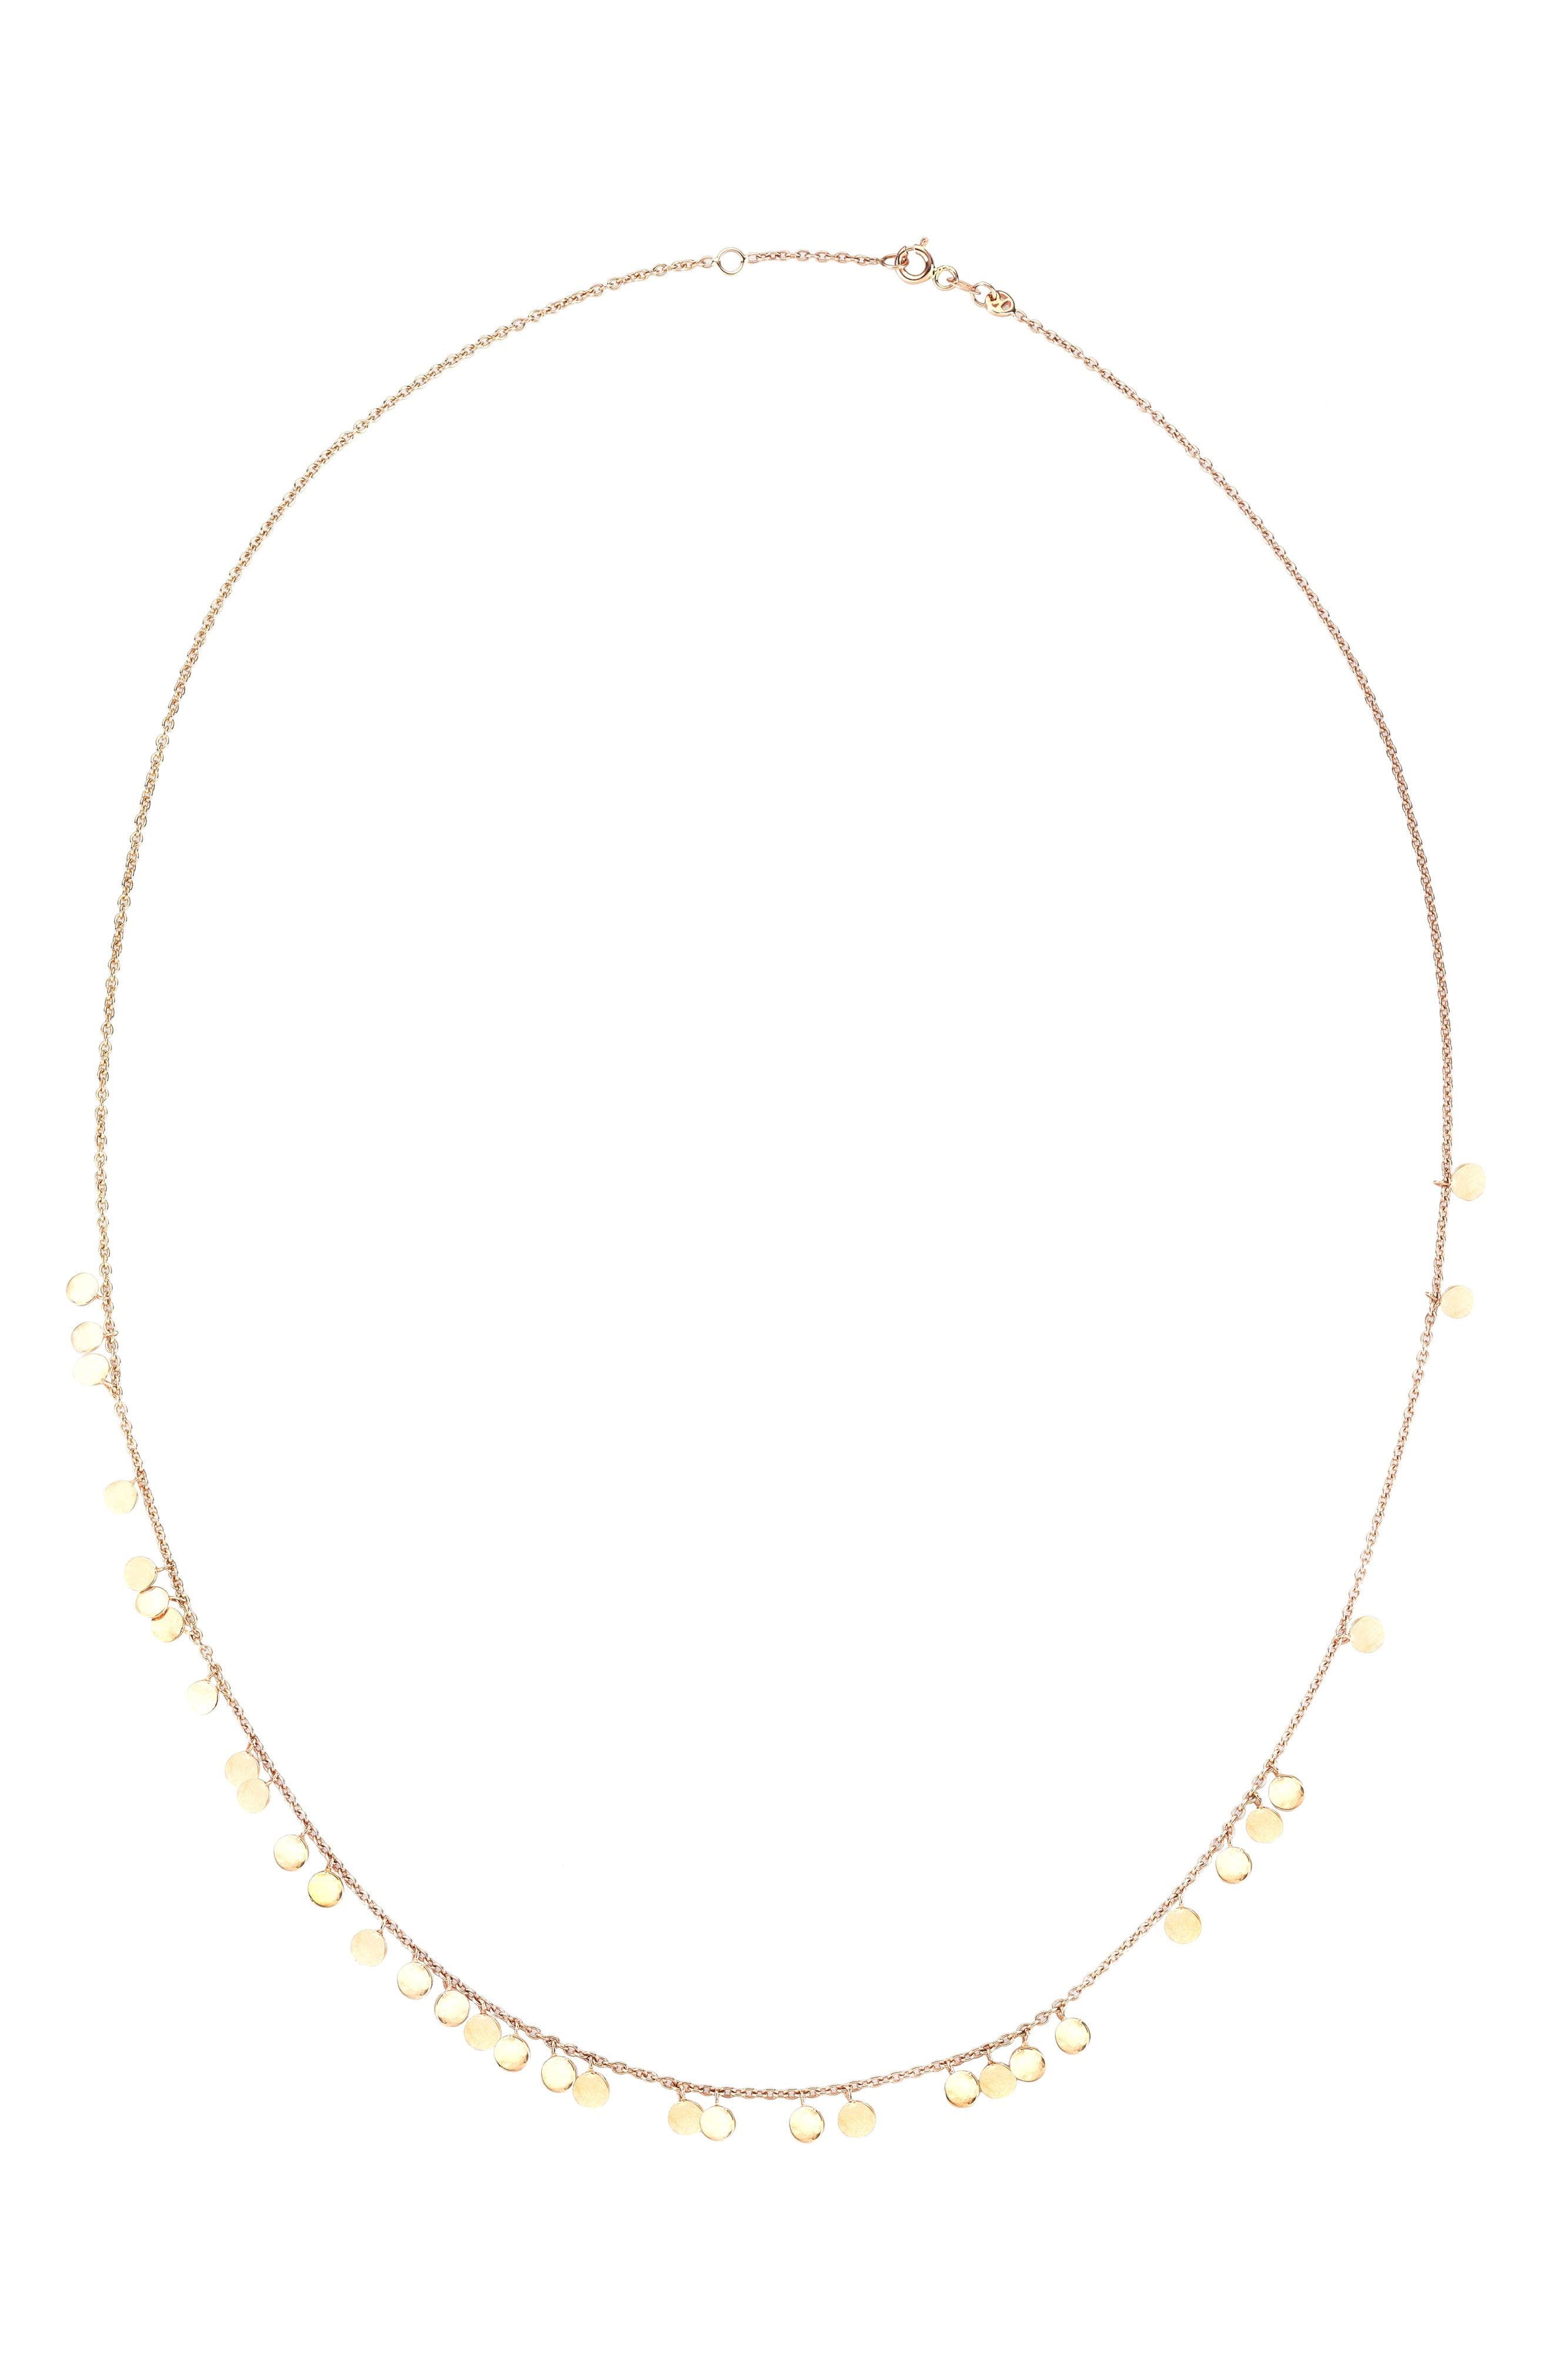 Dangling Circles Pendant Necklace,                             Alternate thumbnail 2, color,                             ROSE GOLD